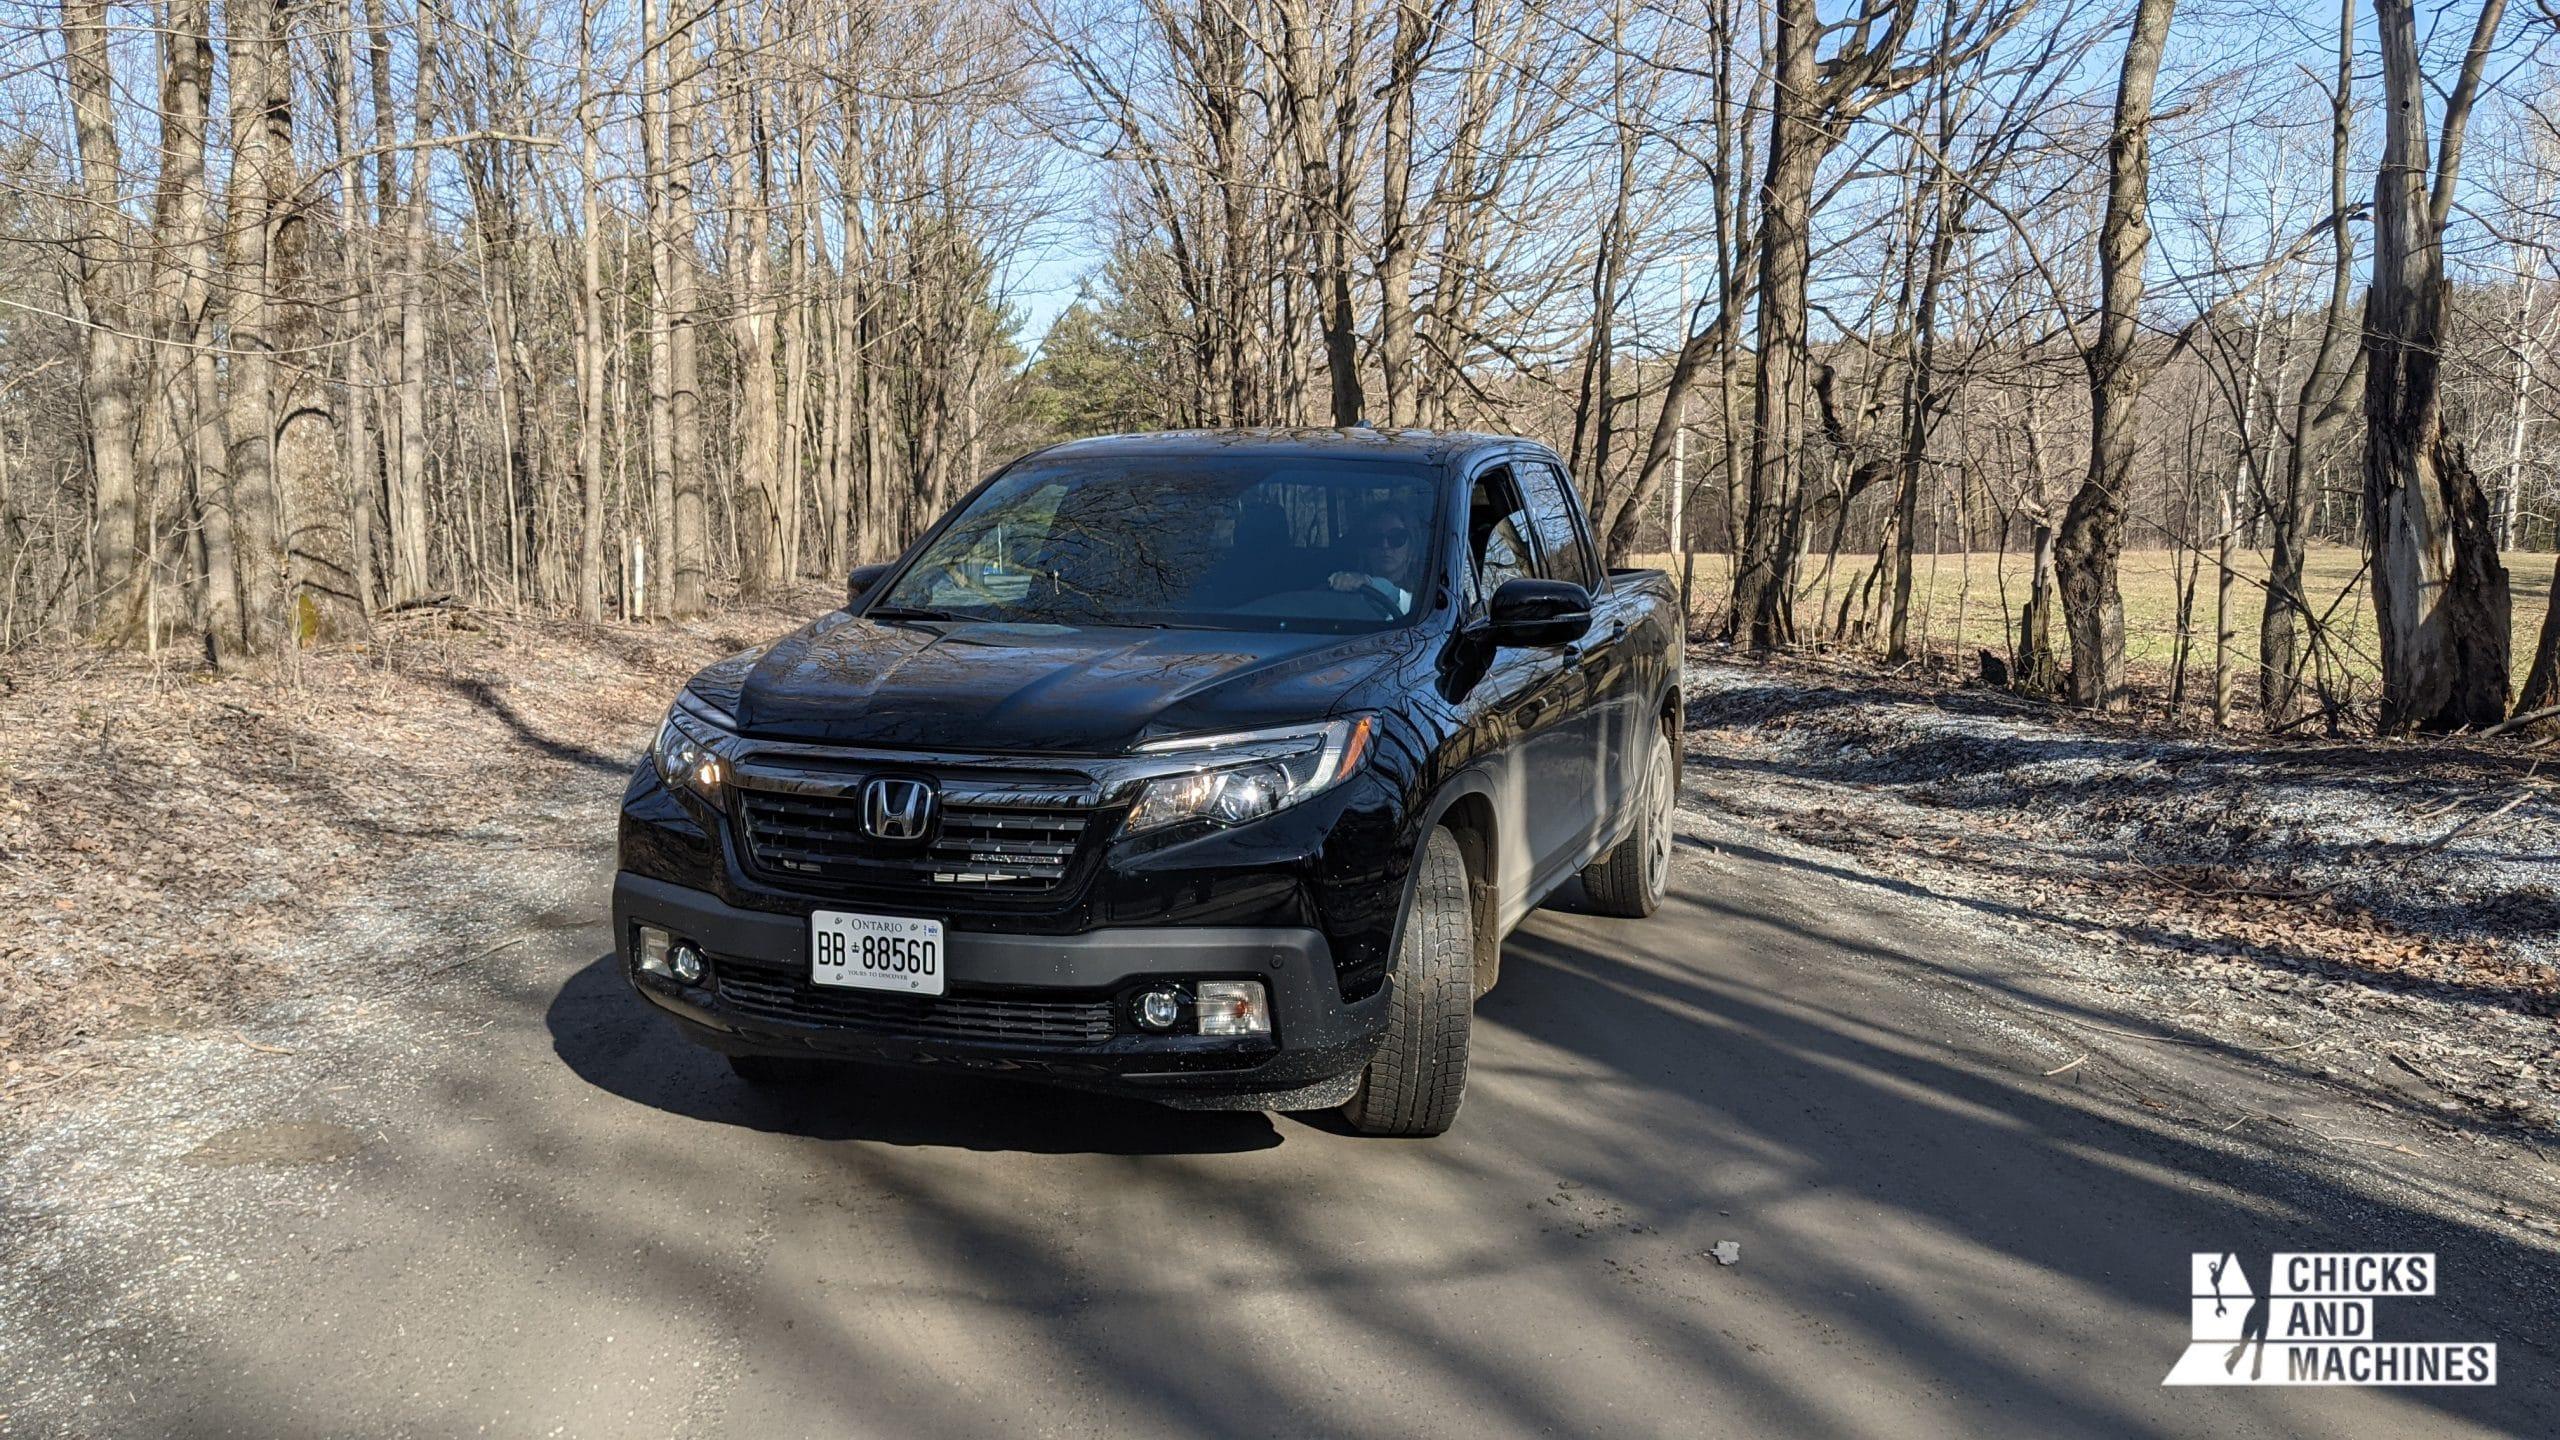 Cyndi driving the 2020 Honda Ridgeline Black Edition